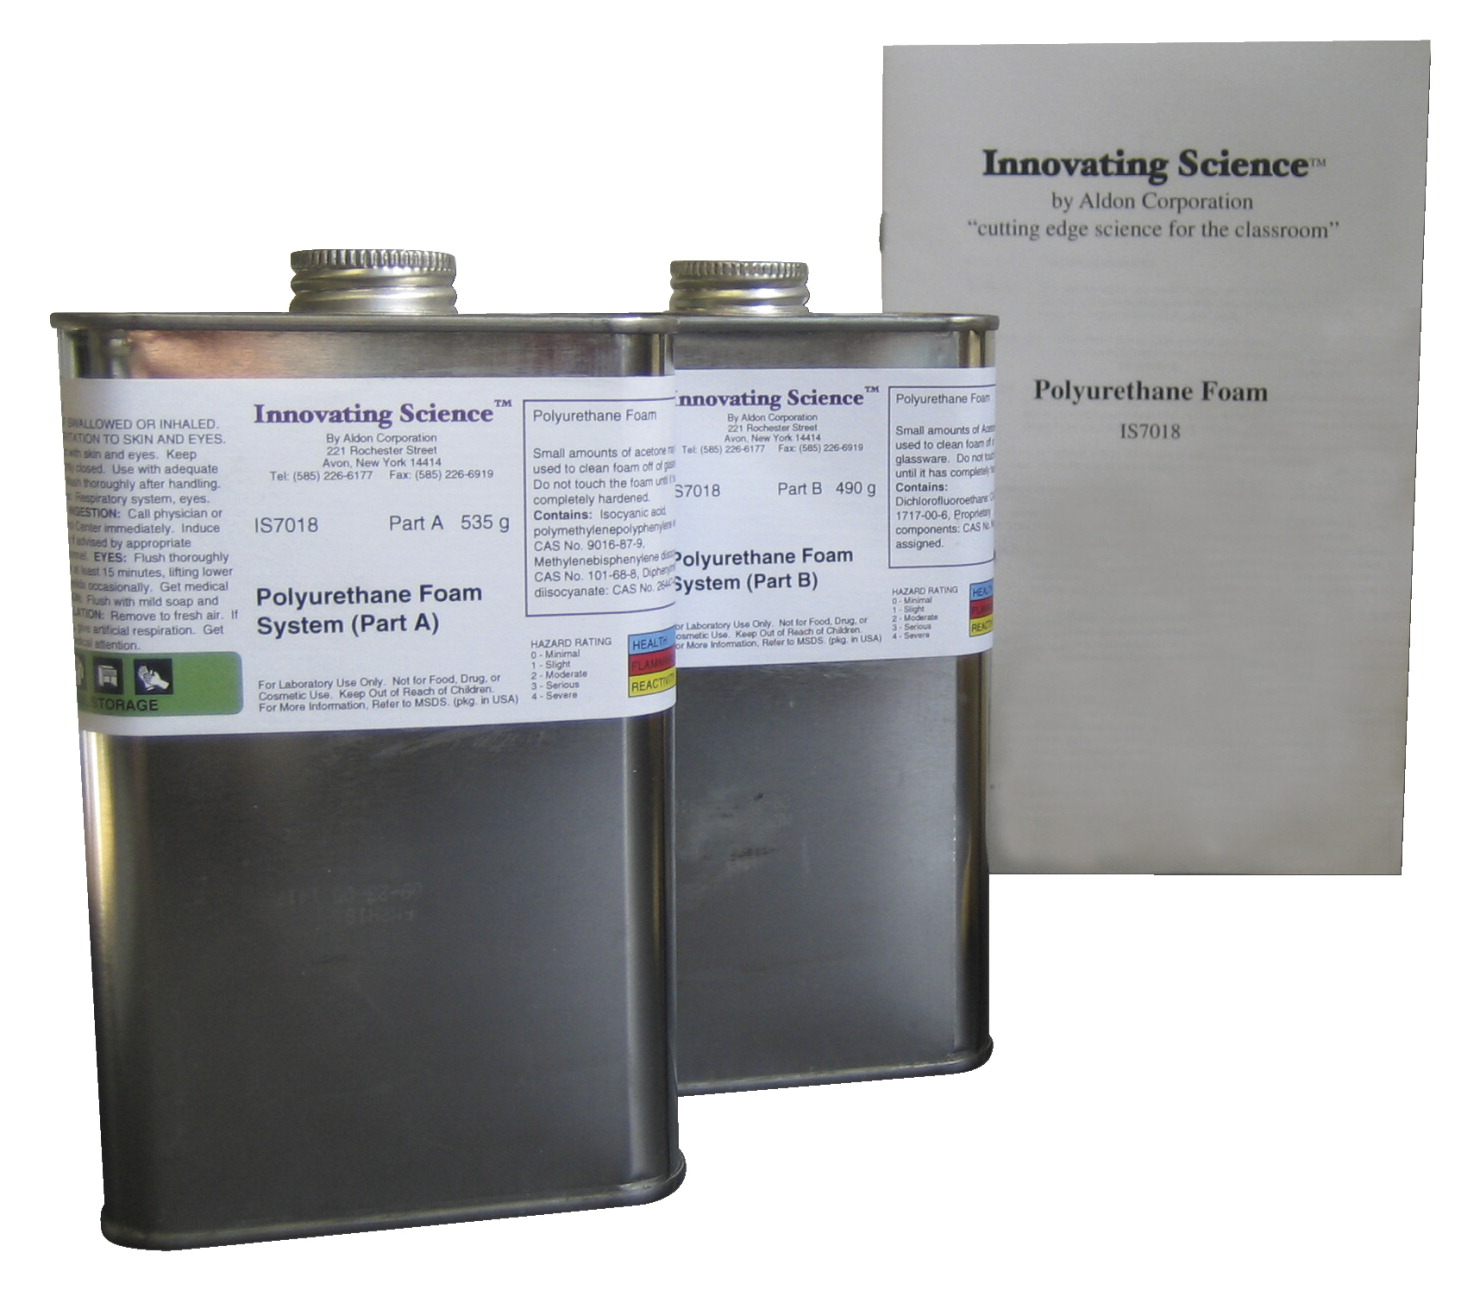 Innovating Science Polyurethane Foam Demonstration Kit